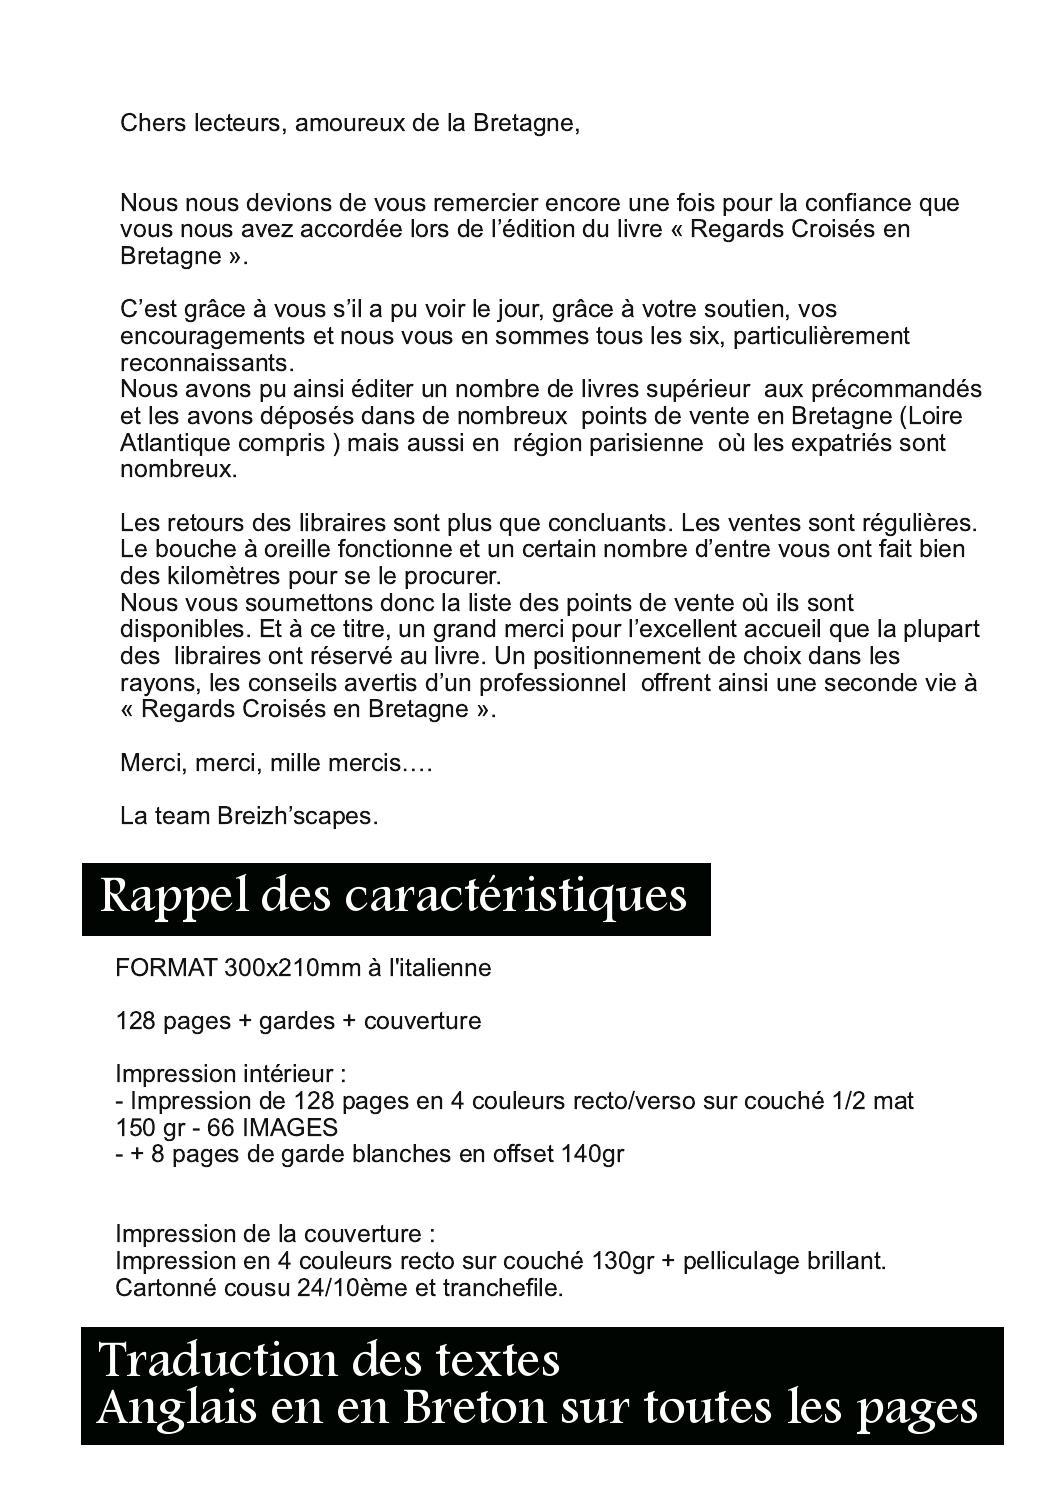 Merci Mille Fois En Italien : merci, mille, italien, Breizhscapes, N°14, Collectif, BREIZHSCAPES, Photographes, Bretagne, Vebuka.com